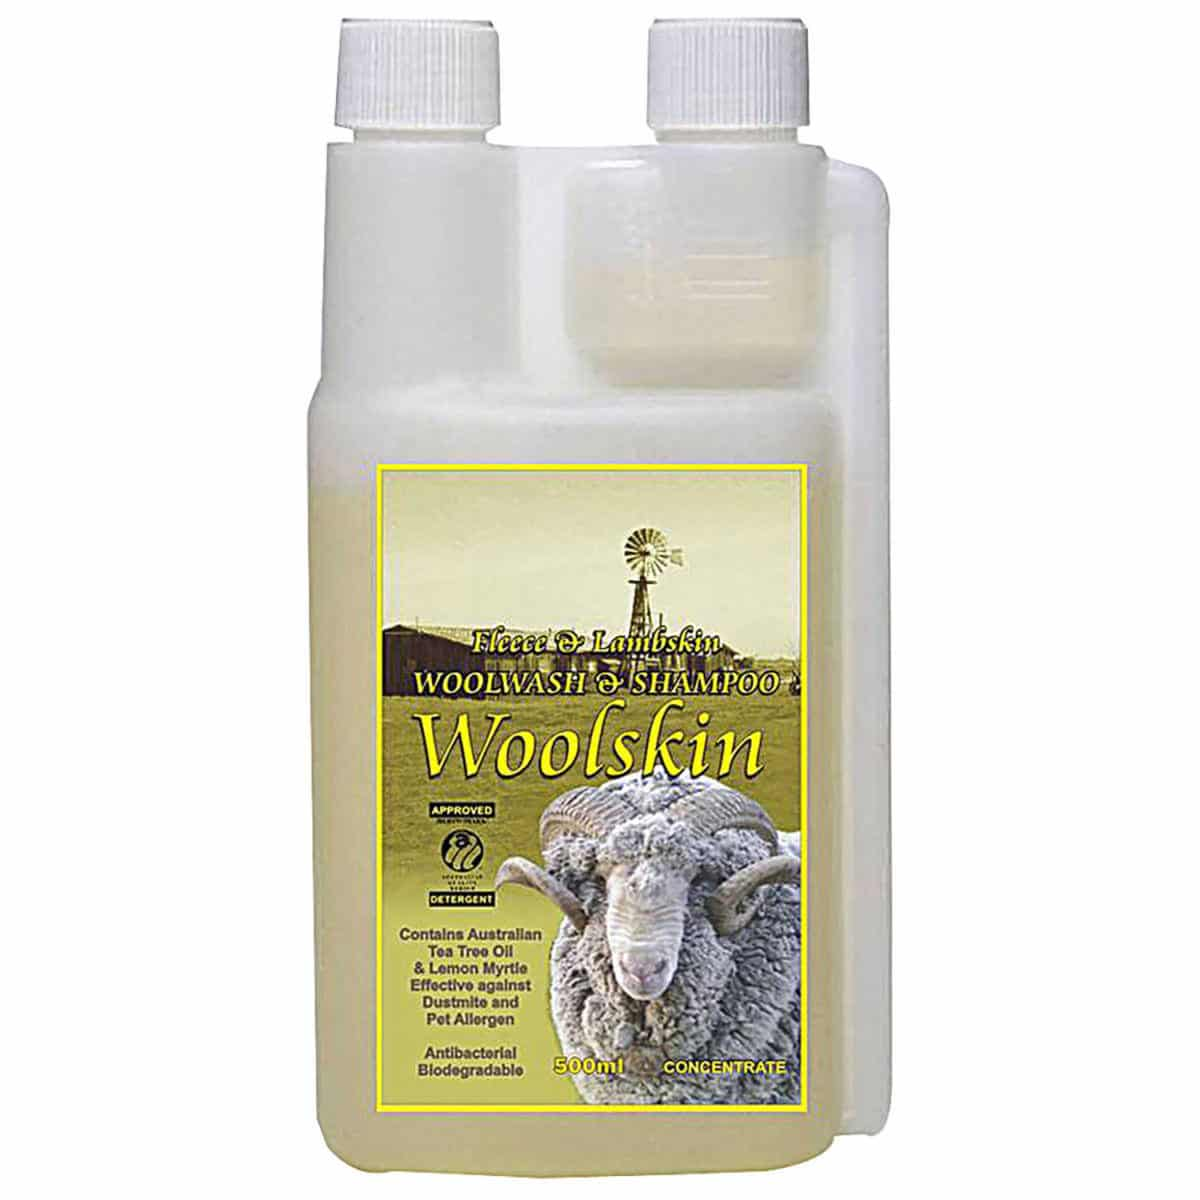 Woolskin Wool Wash Shampoo